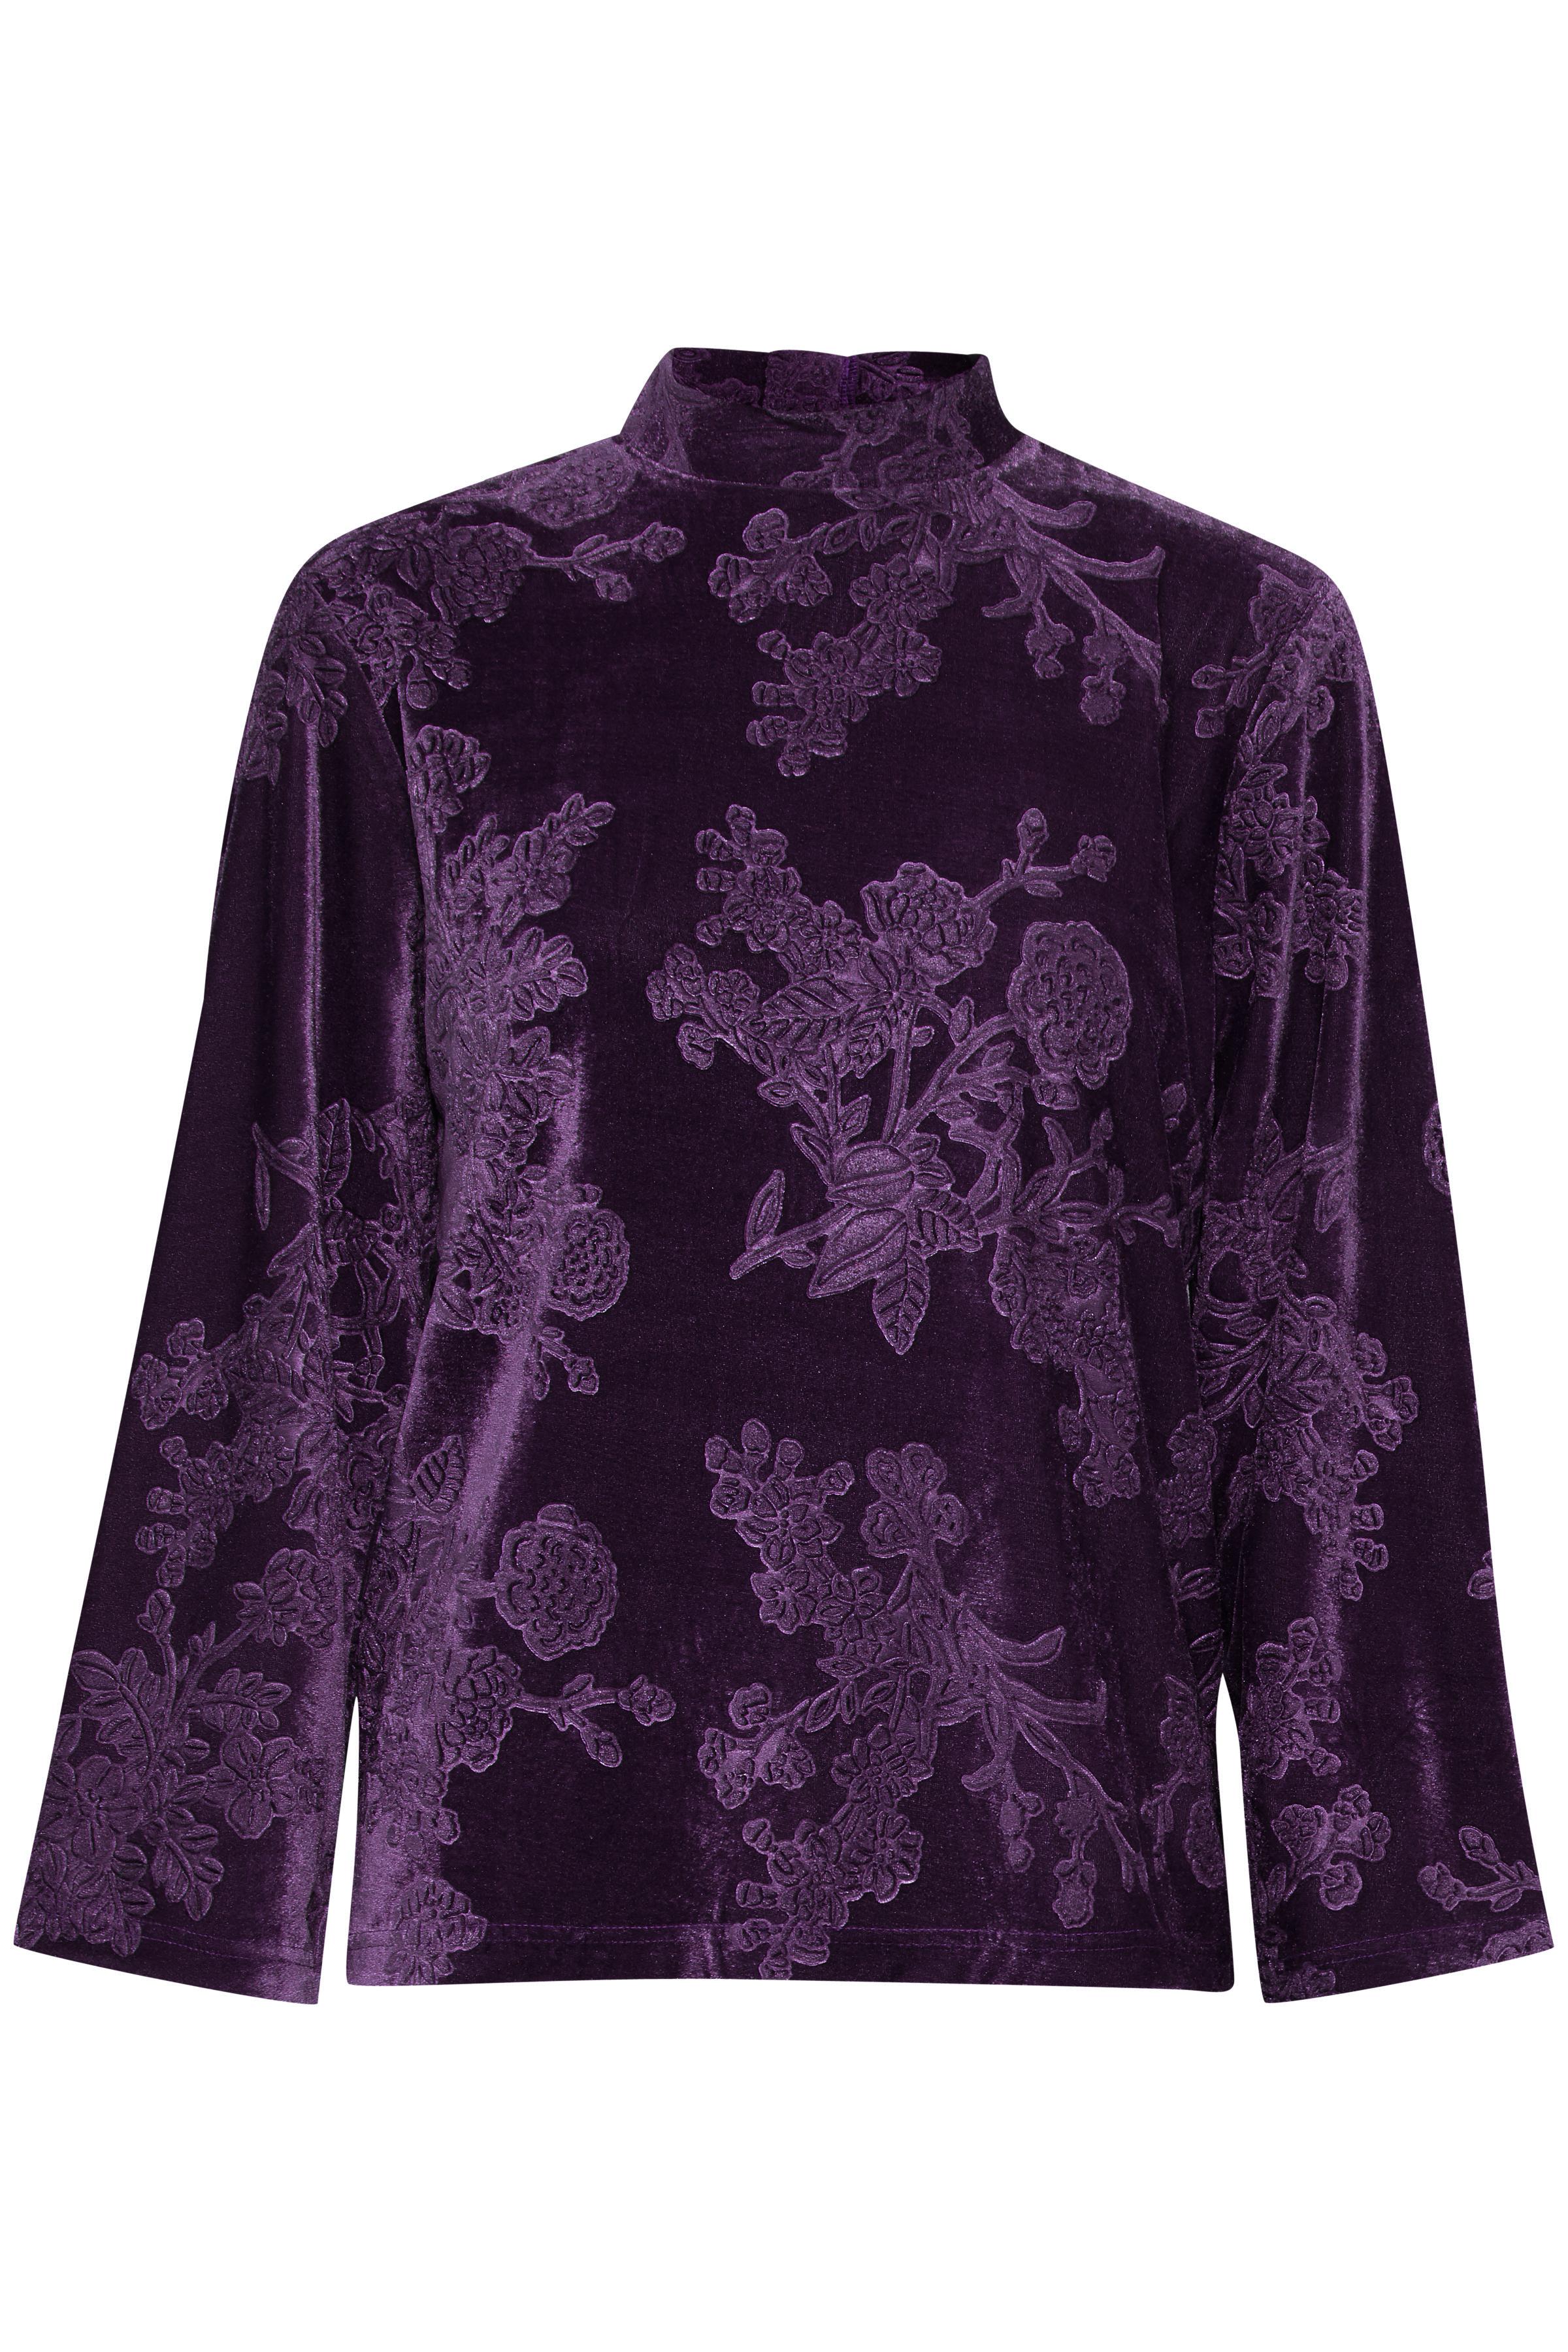 Blackberry Purple Langærmet bluse fra b.young – Køb Blackberry Purple Langærmet bluse fra str. XS-XXL her